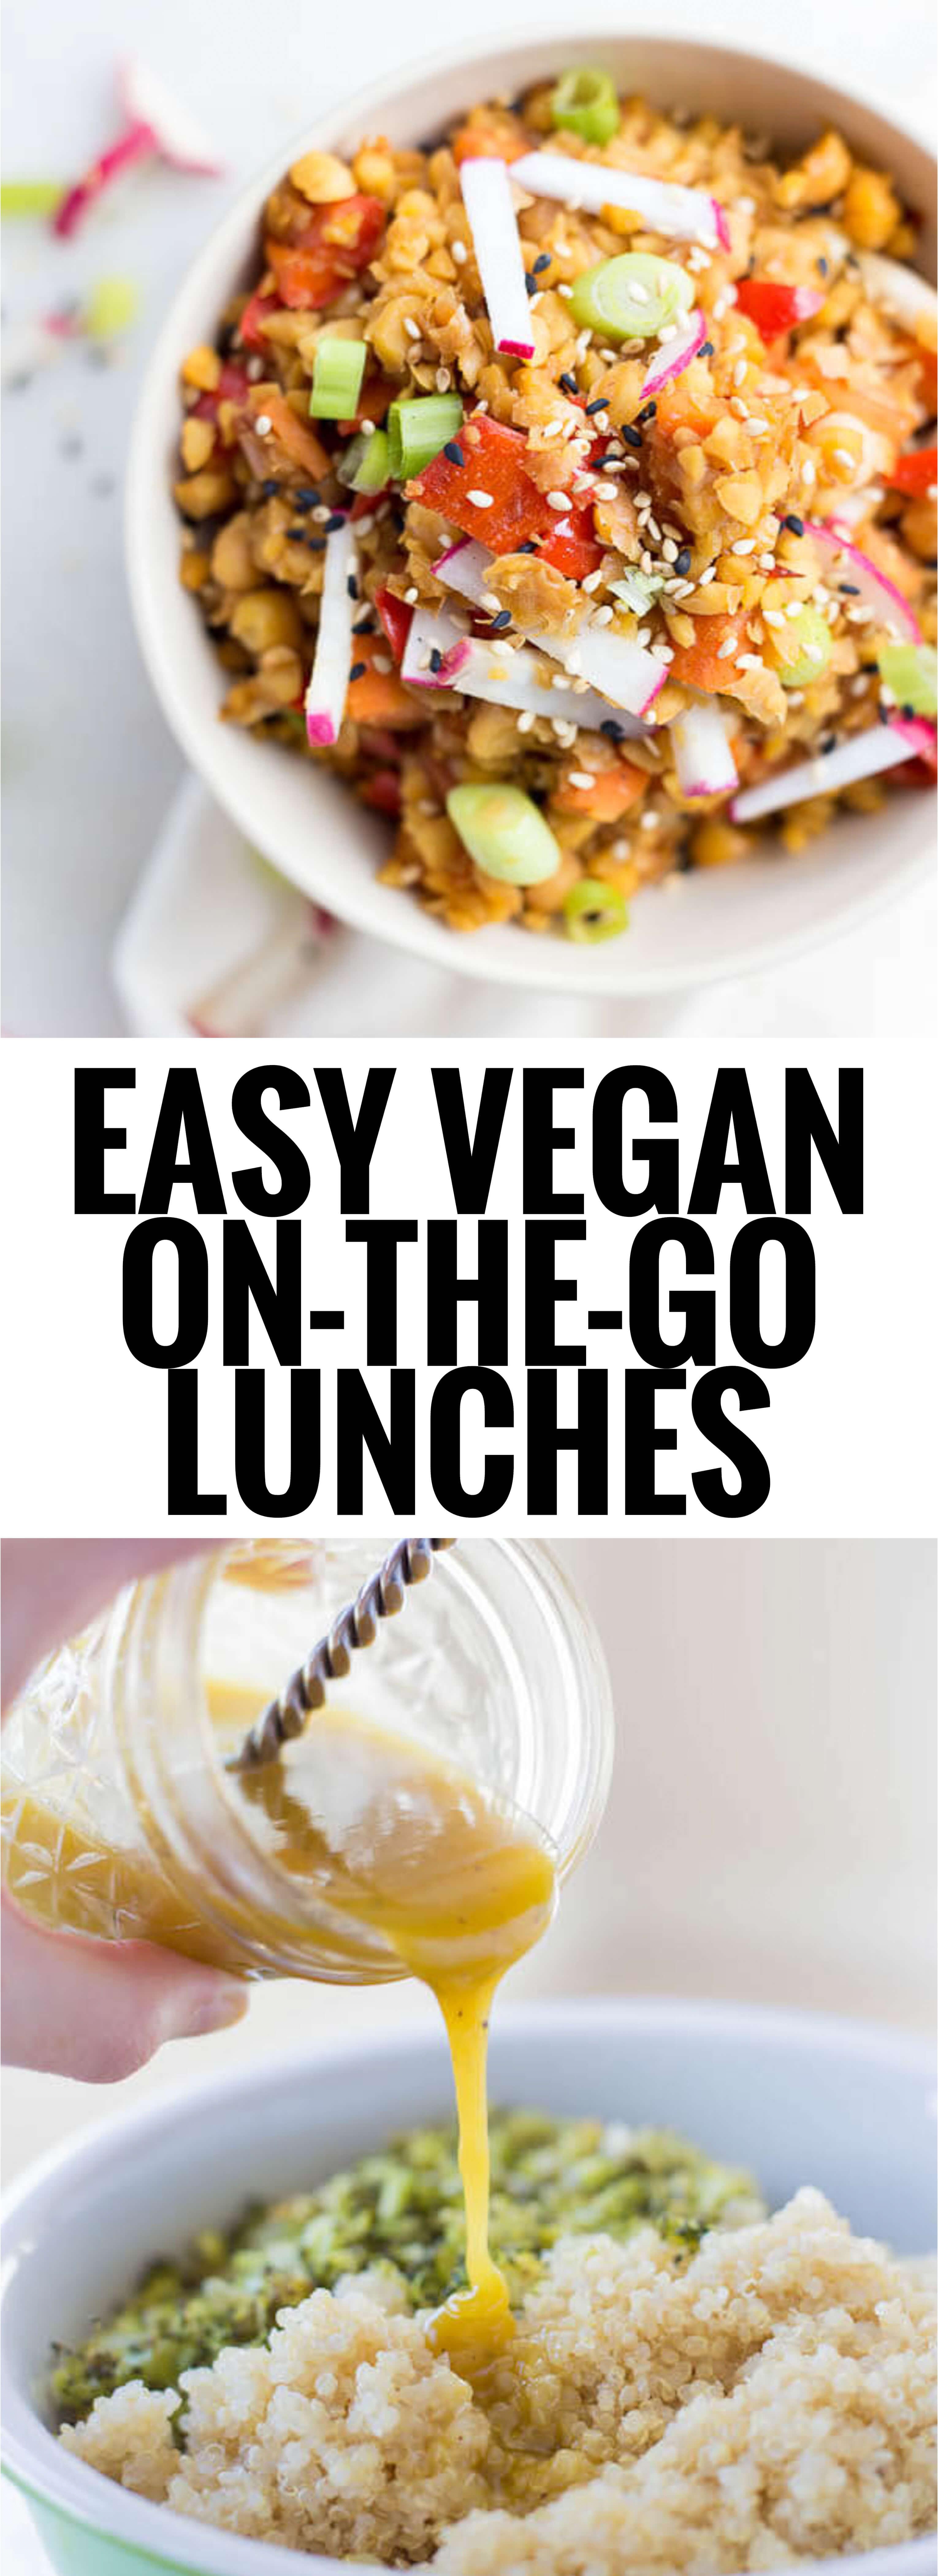 Easy Vegan Recipes  Easy Vegan the Go Lunches Fooduzzi